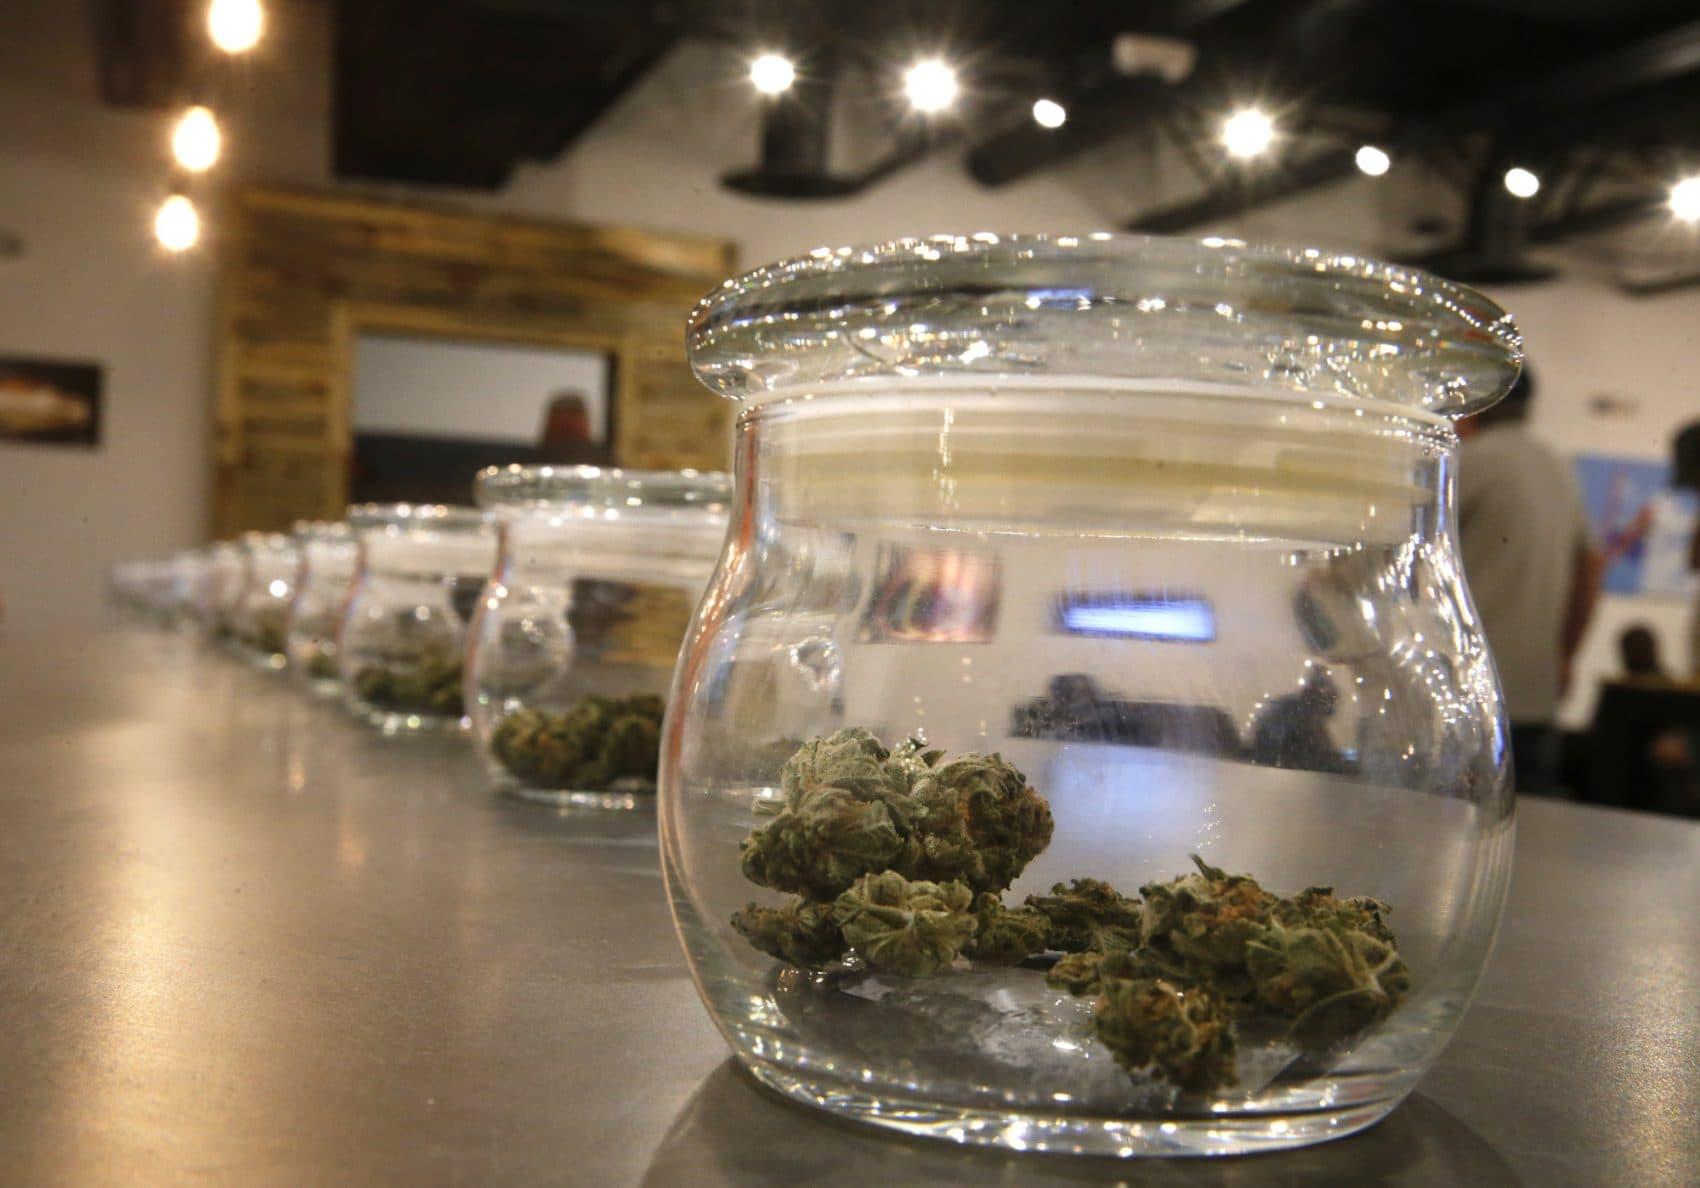 Marijuana for sale kept in jars for customers to sample smells at a recreational marijuana store in Aurora, Colorado. (Brennan Linsley/AP)